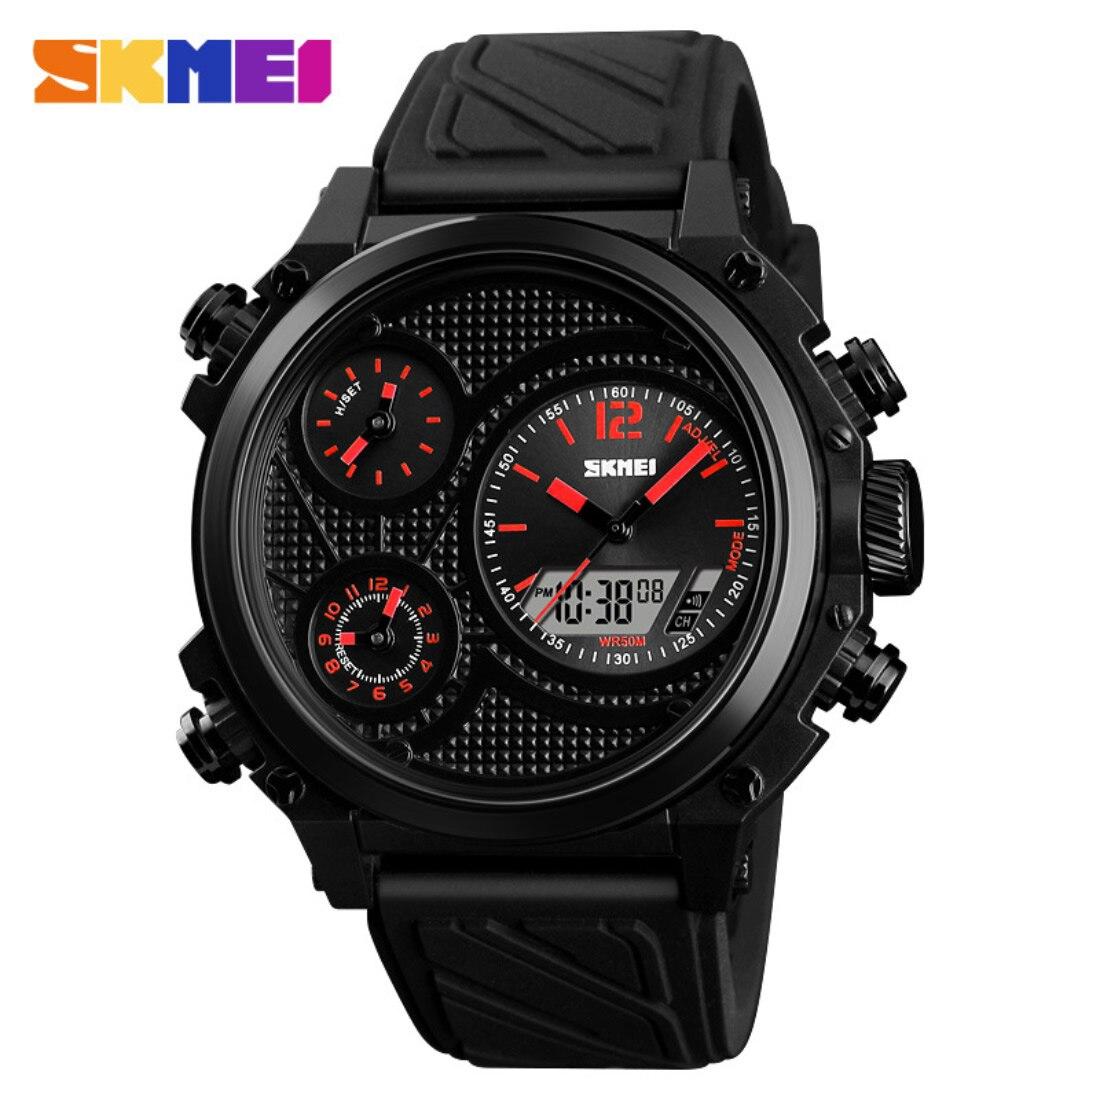 Black Men Quartz Wristwatches 3 Eyes Analog Sport Watches Luxury Military Reloj Hombre New Design Father Day Gift Silicone Hour